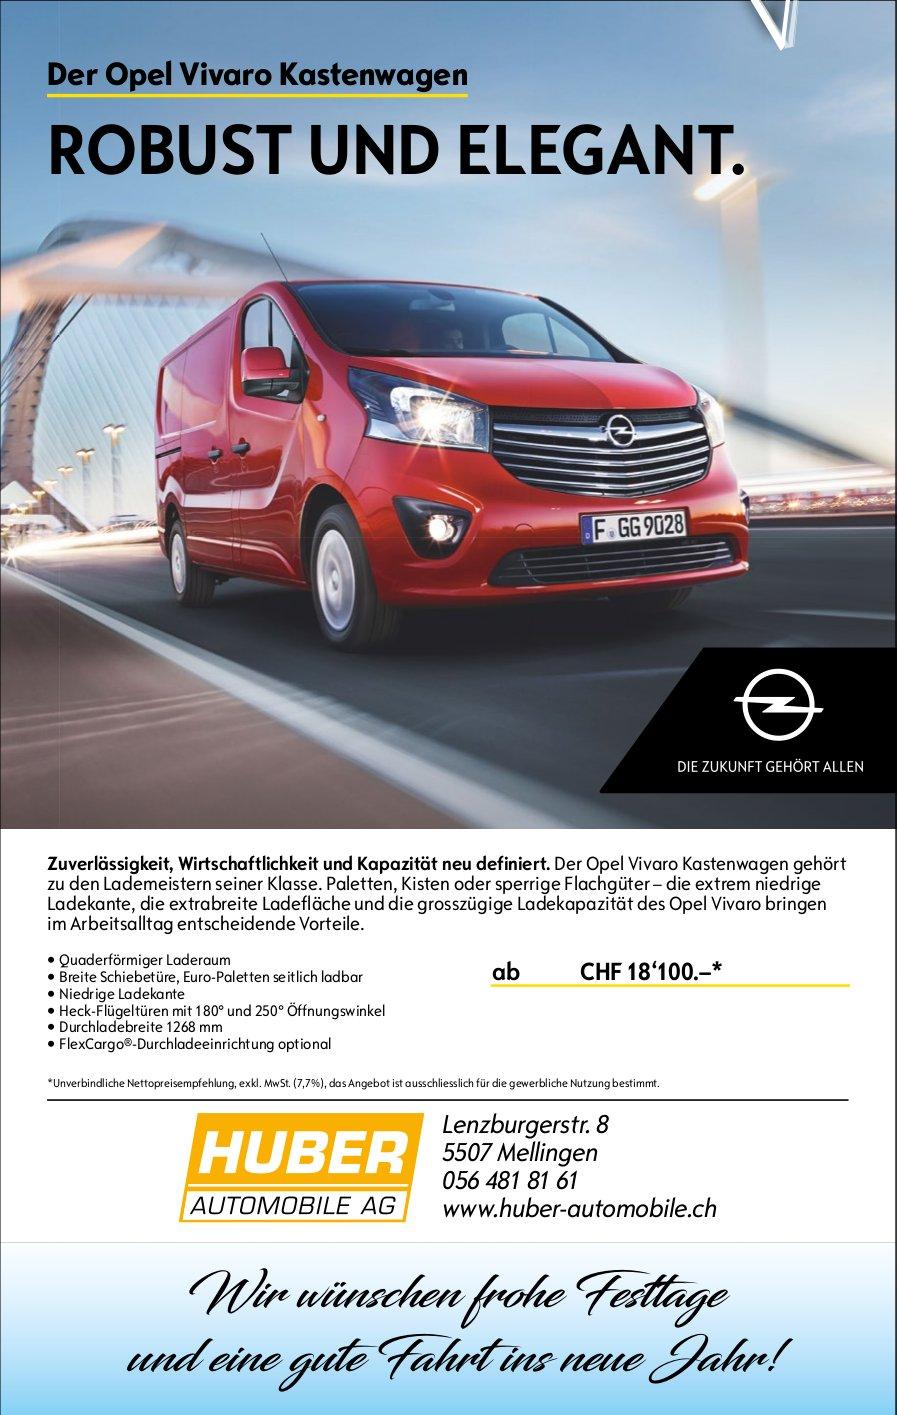 Der Opel Vivaro Kastenwagen, Huber Automobile AG